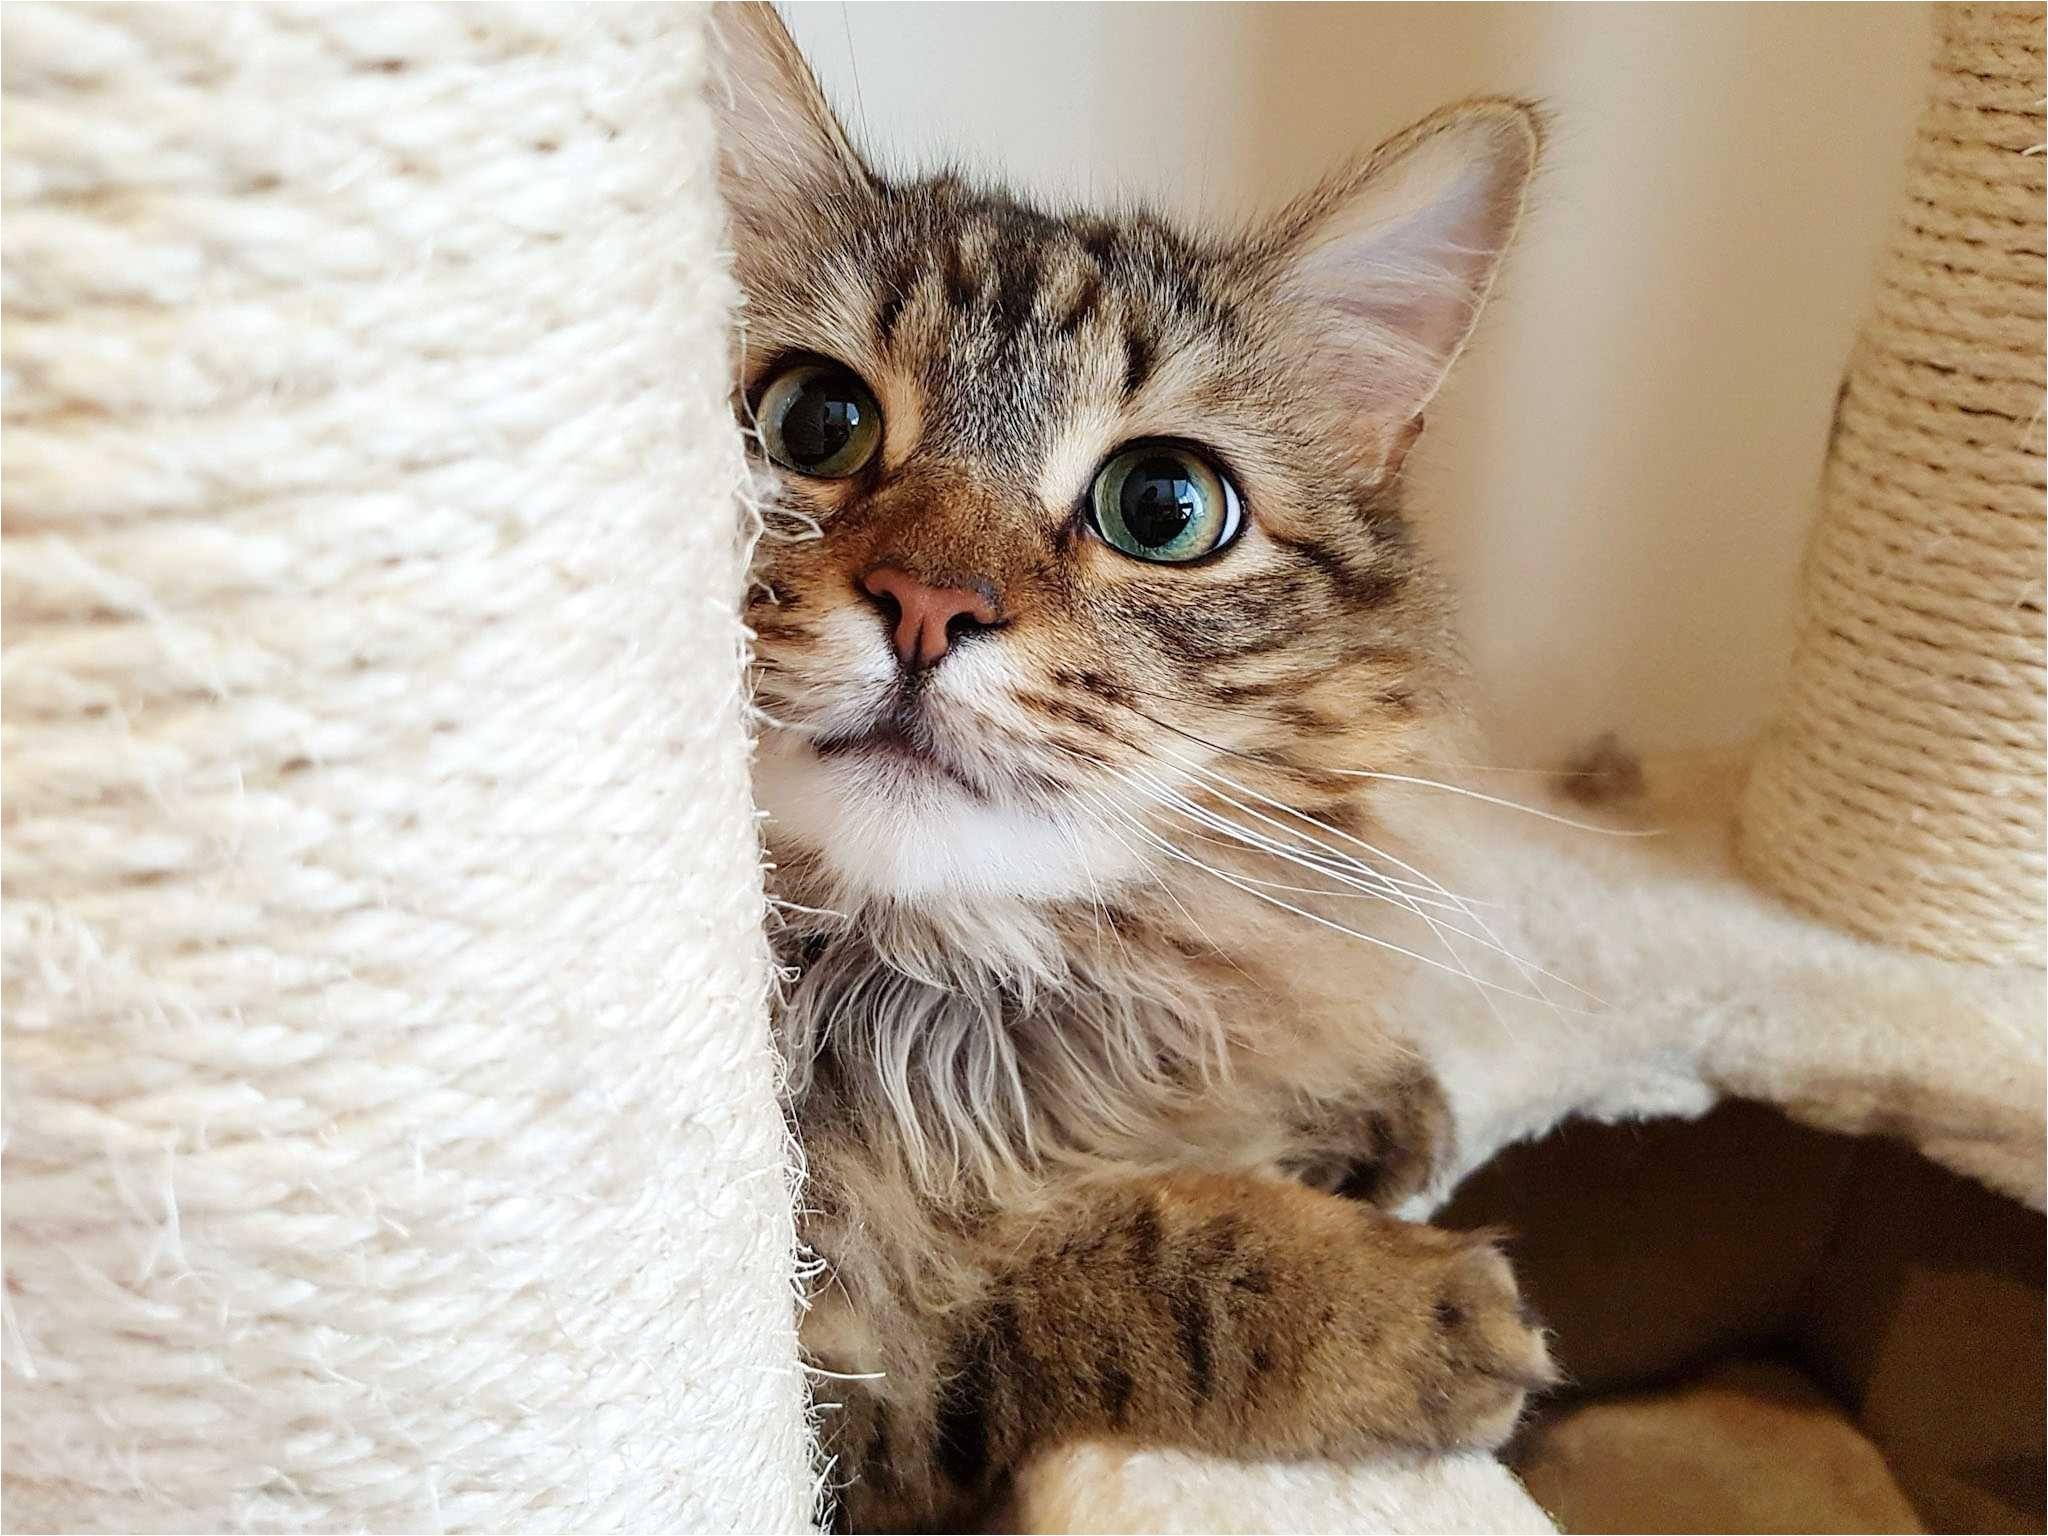 a fluffy cat behind the scratching post 674506878 5b047815ba61770036c4e1fc